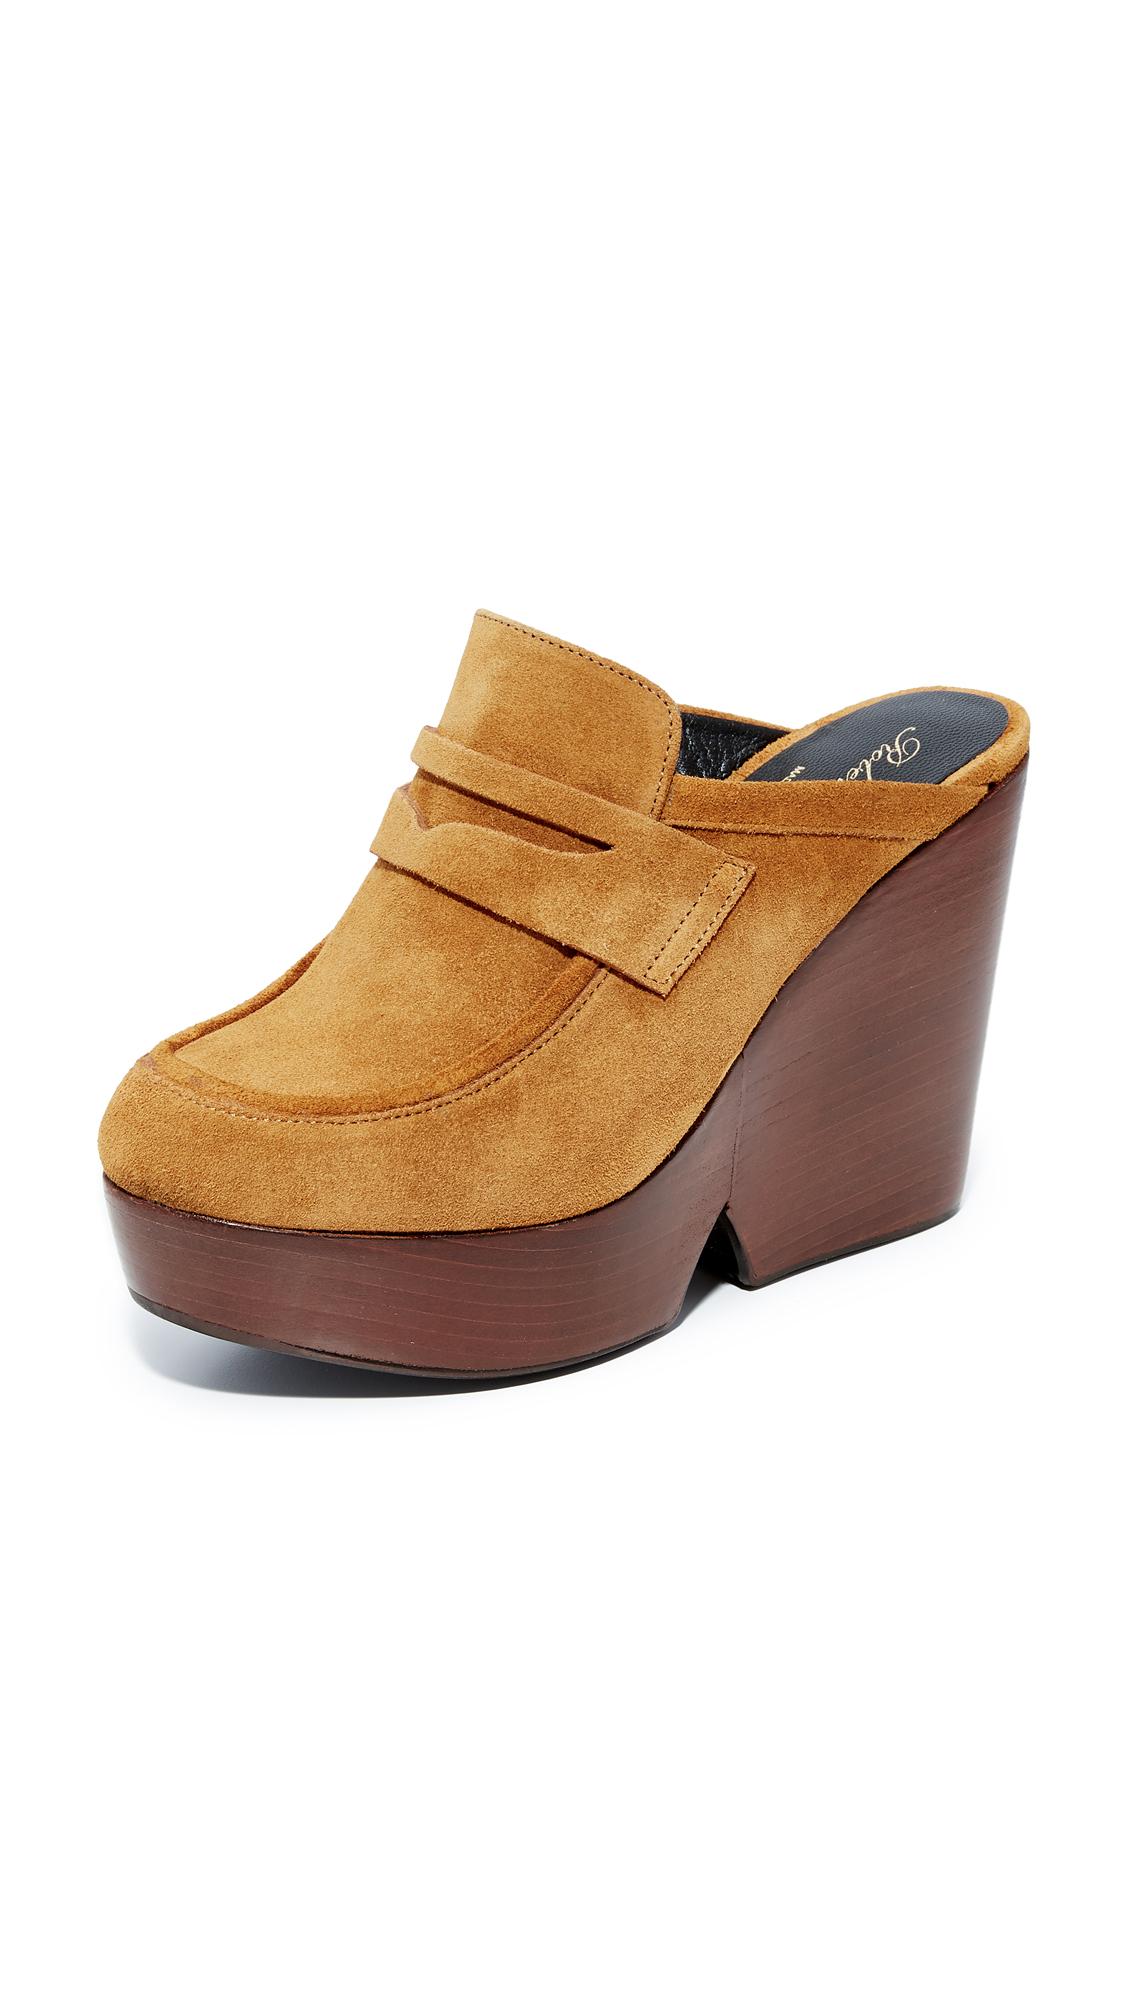 Robert Clergerie Damor Block Heel Sandals - Savanna